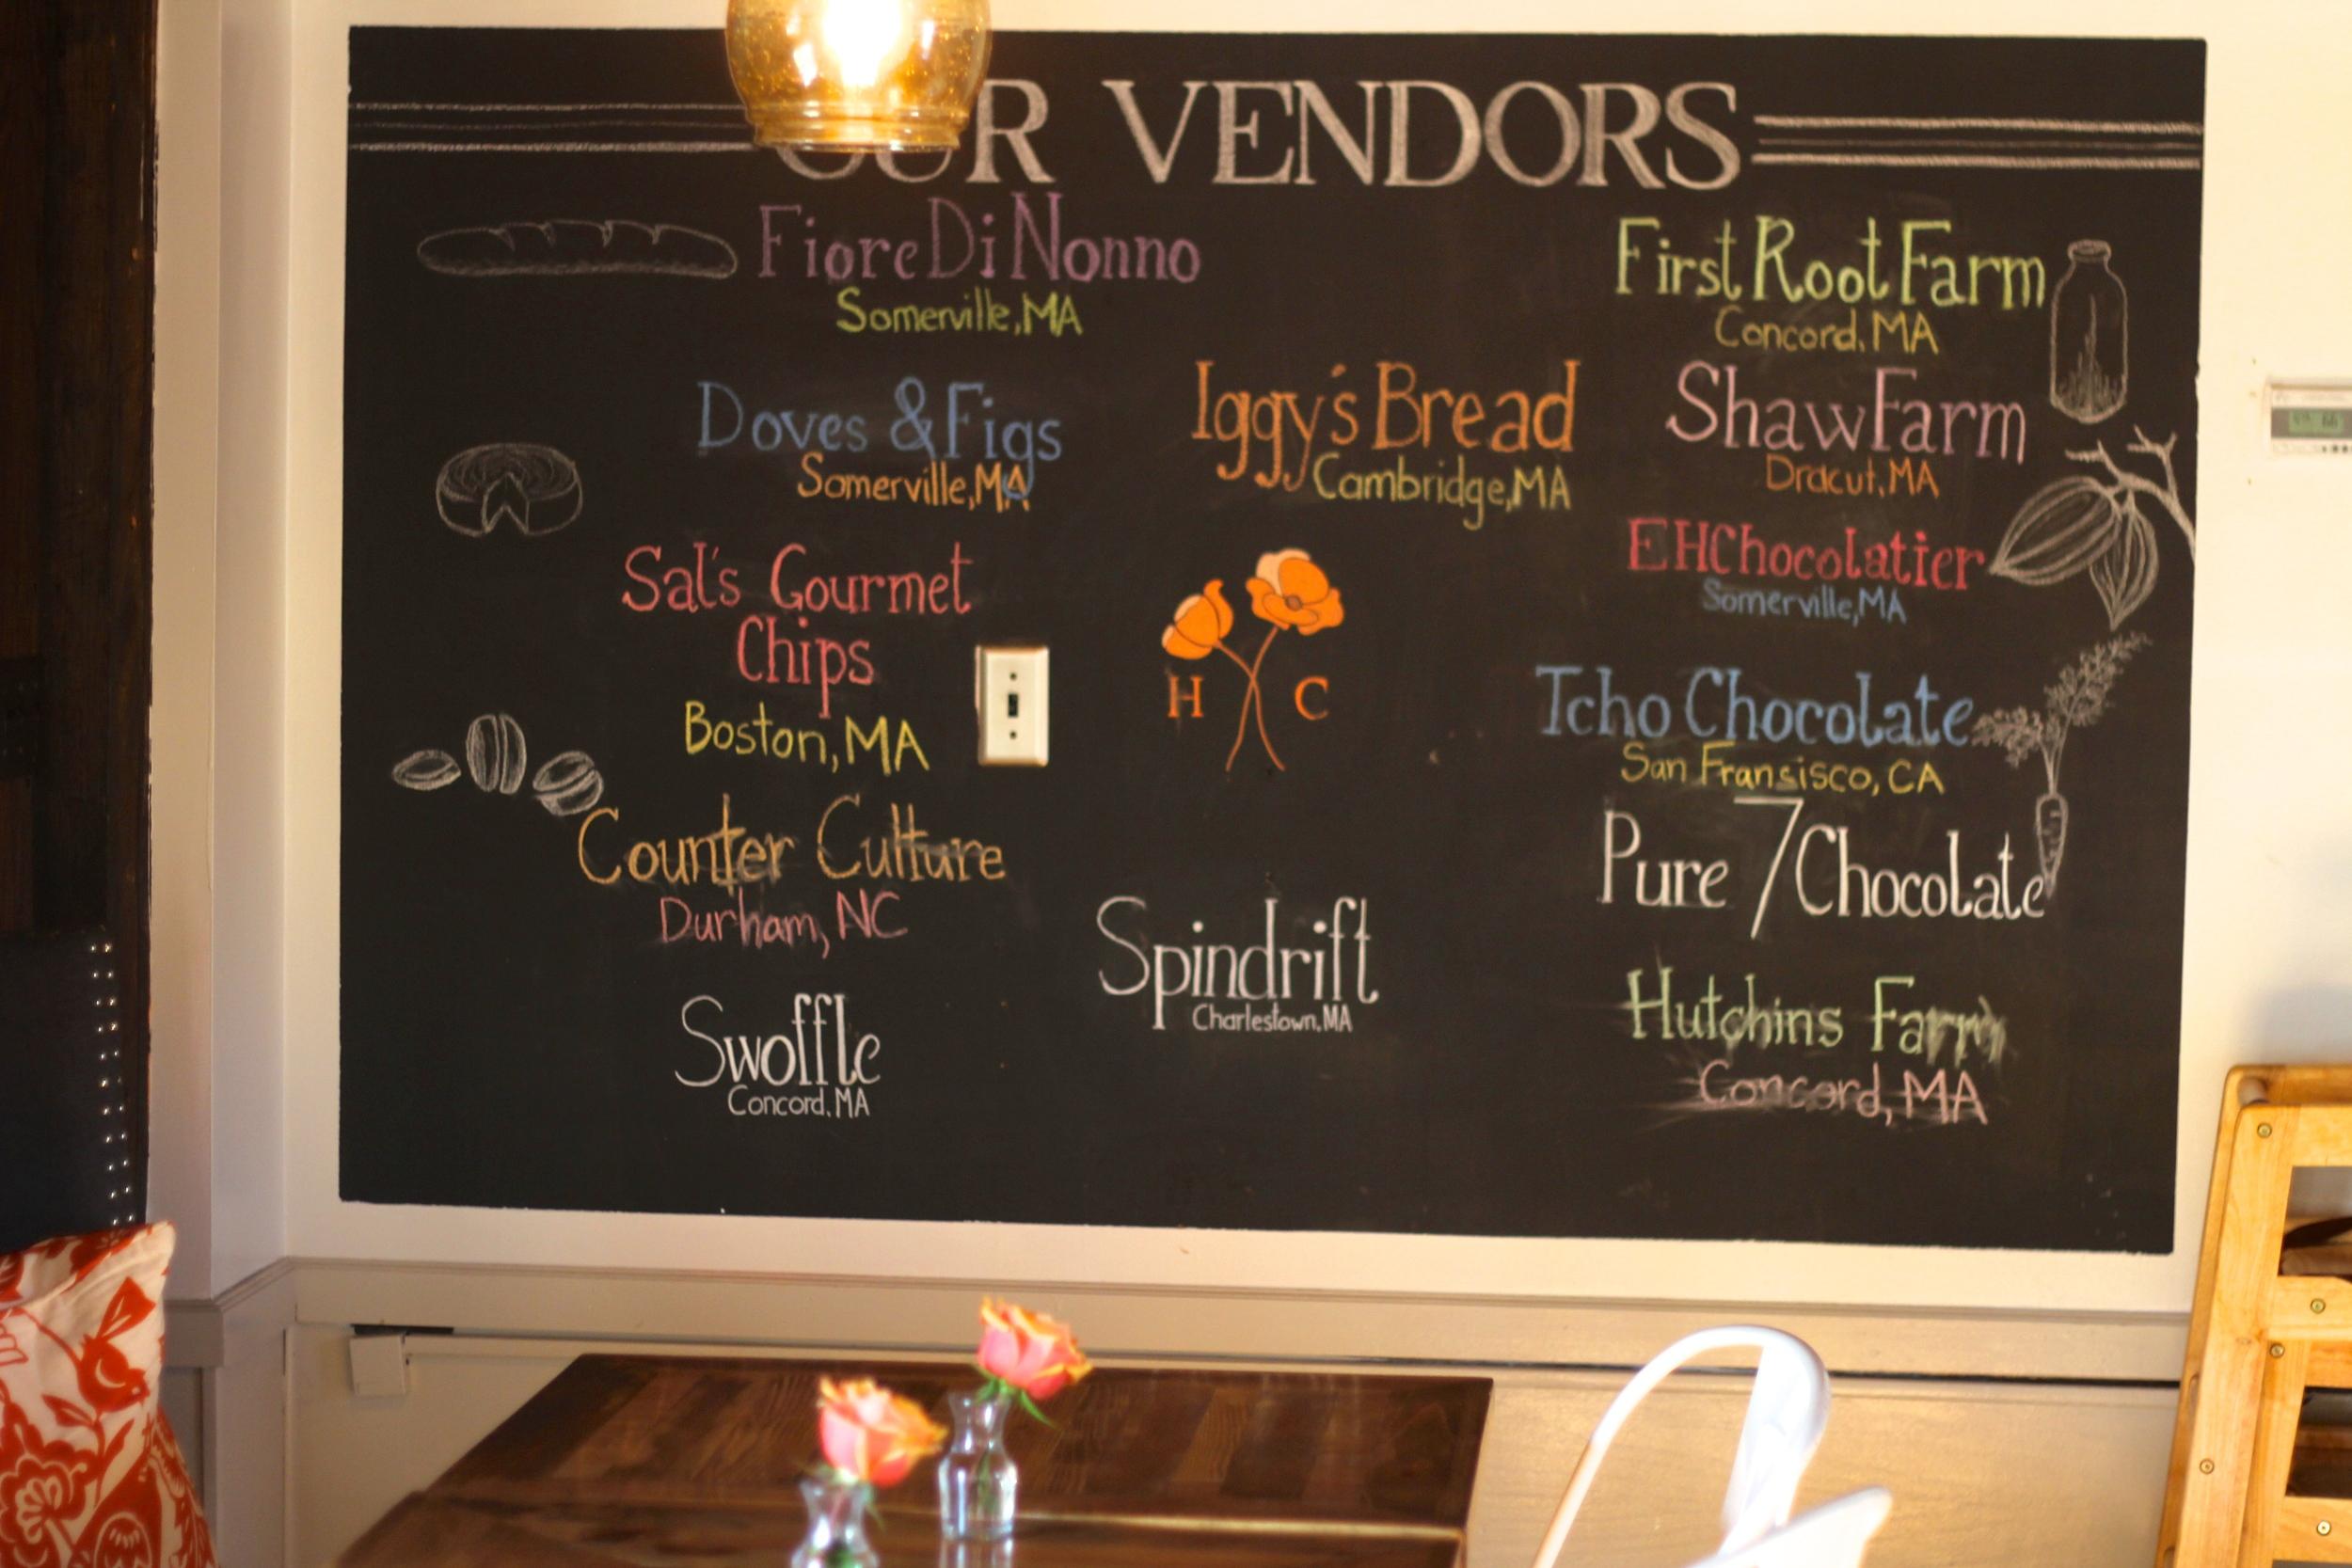 {A list of their vendors}